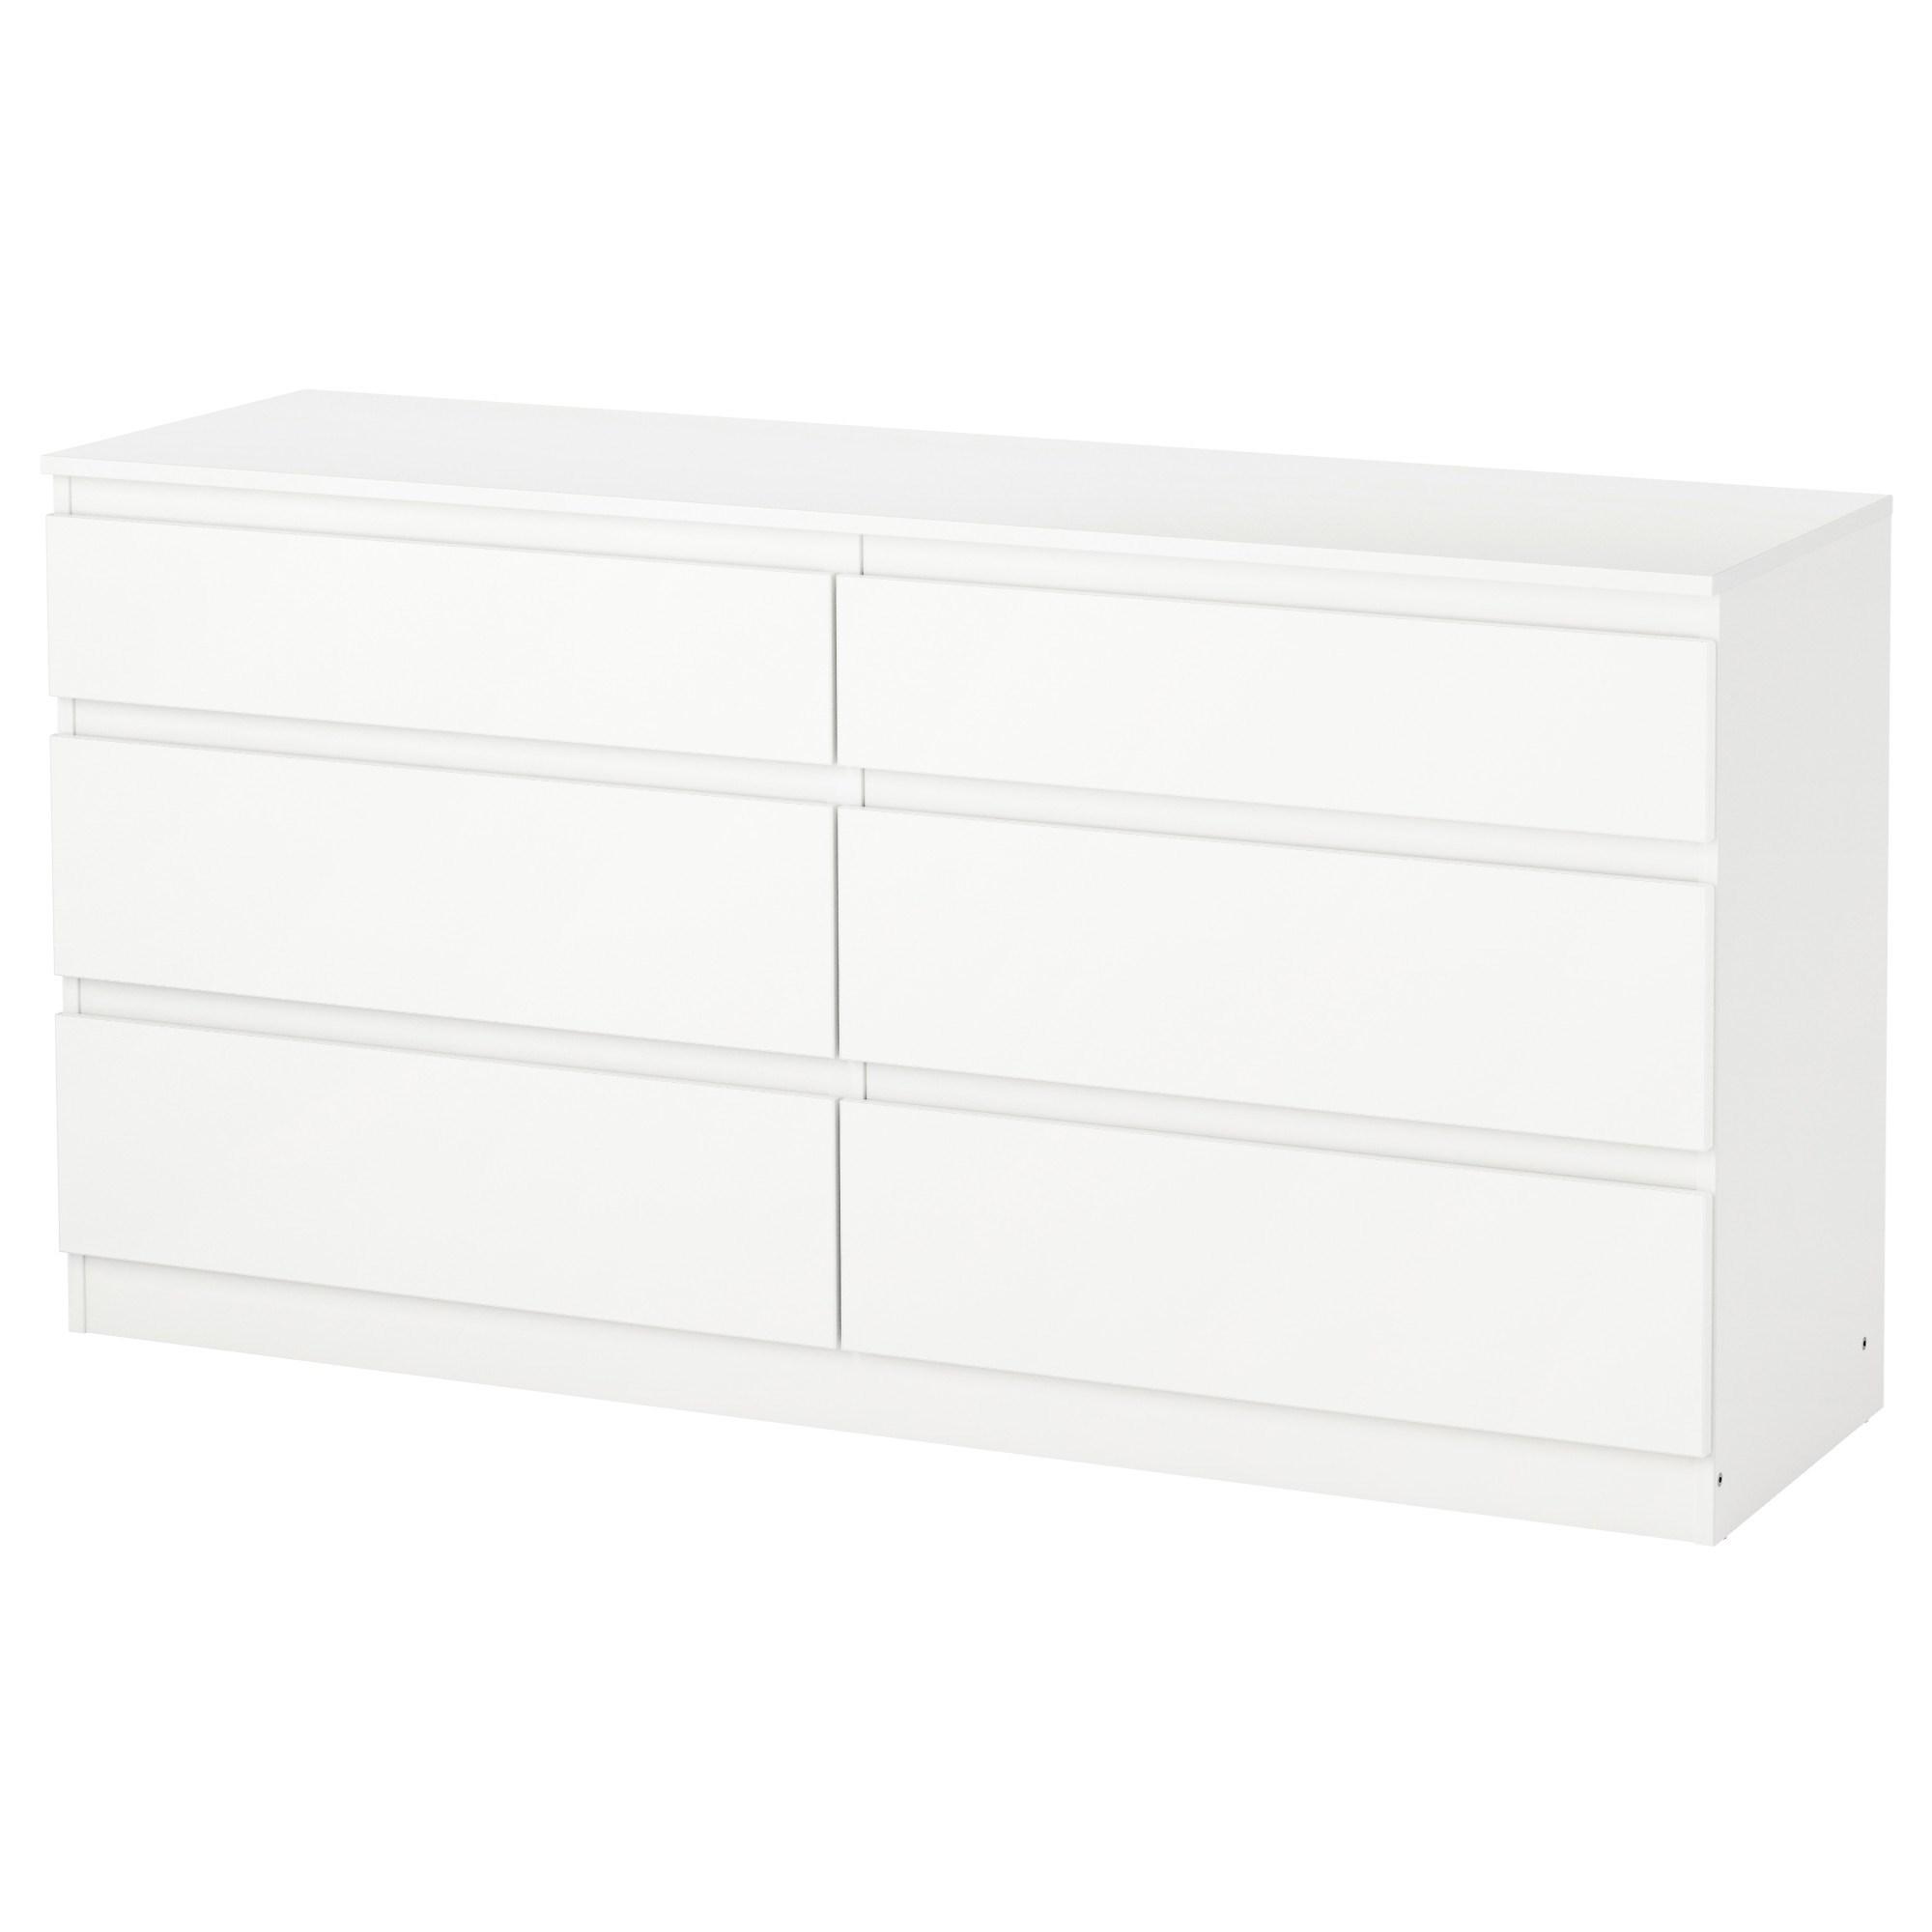 kullen chest of 6 drawers white 140x72 cm | ikea hallway